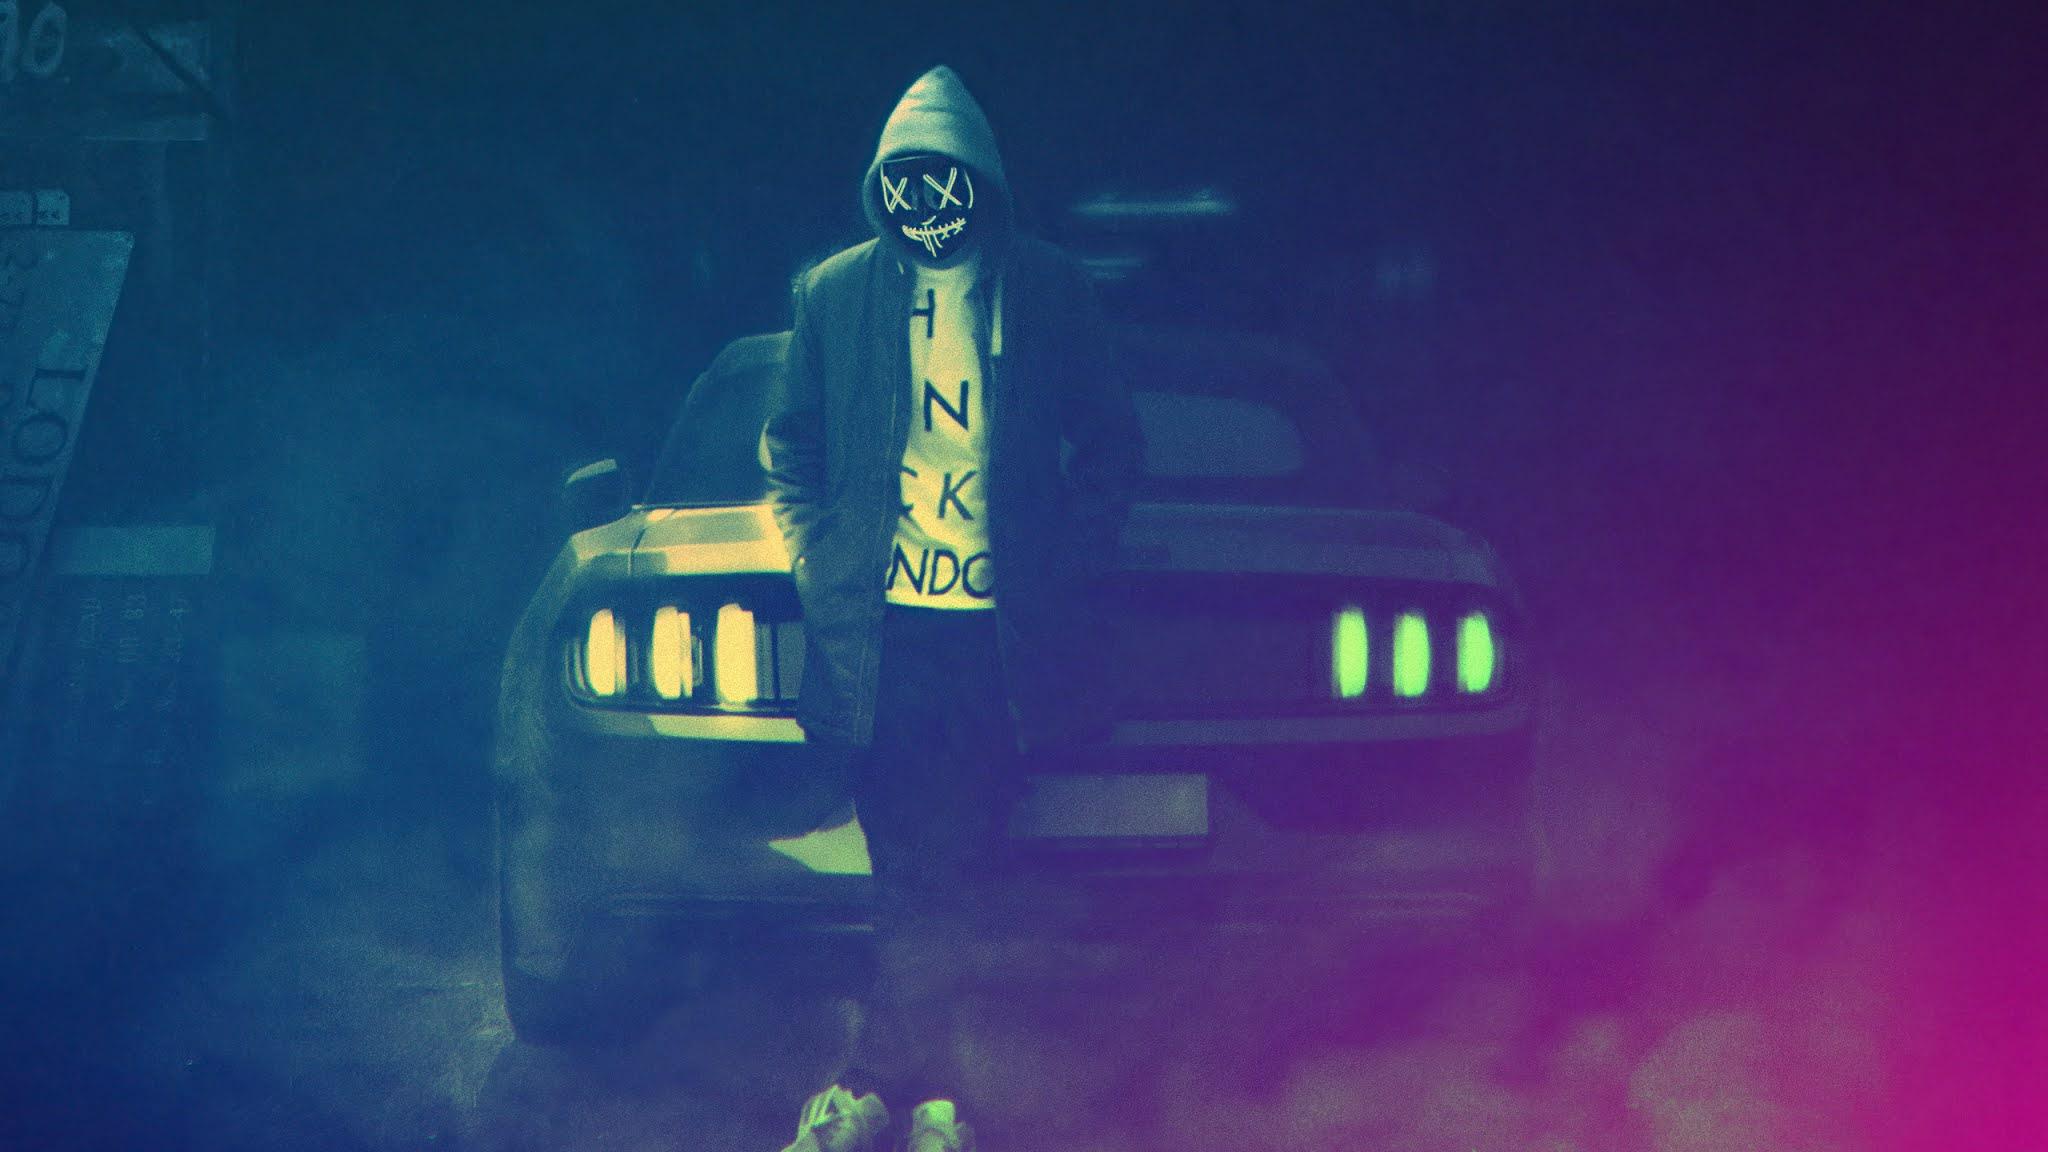 Hd Wallpaper Ford Mustang Hoodie Mask Boy Hd wallpaper ford mustang hoodie mask